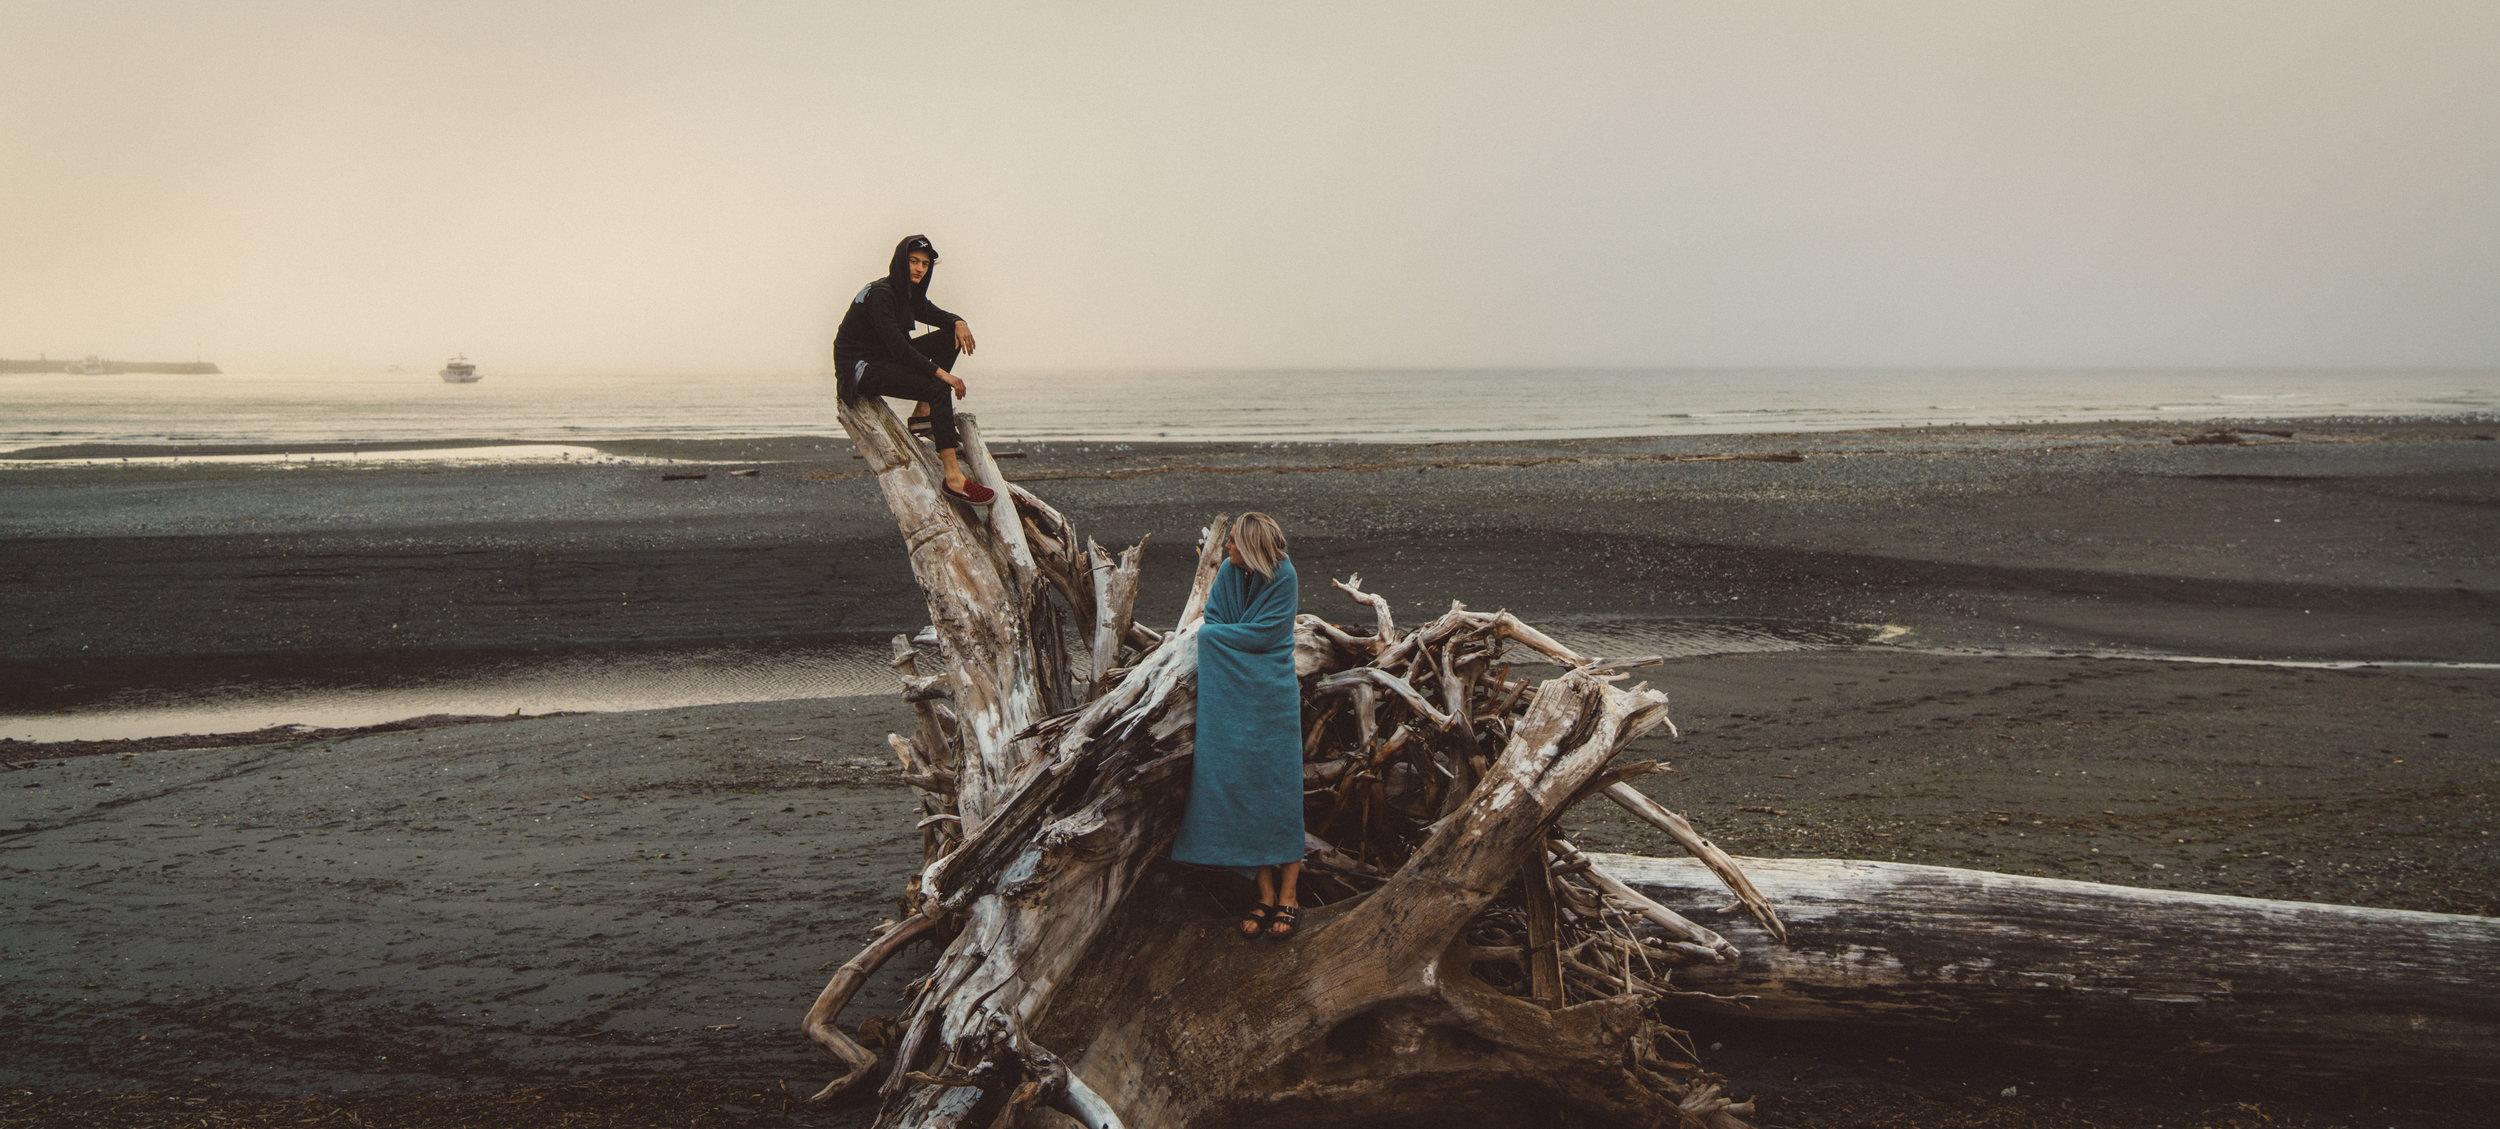 Daria and Vance on the beach in Port Renfrew.